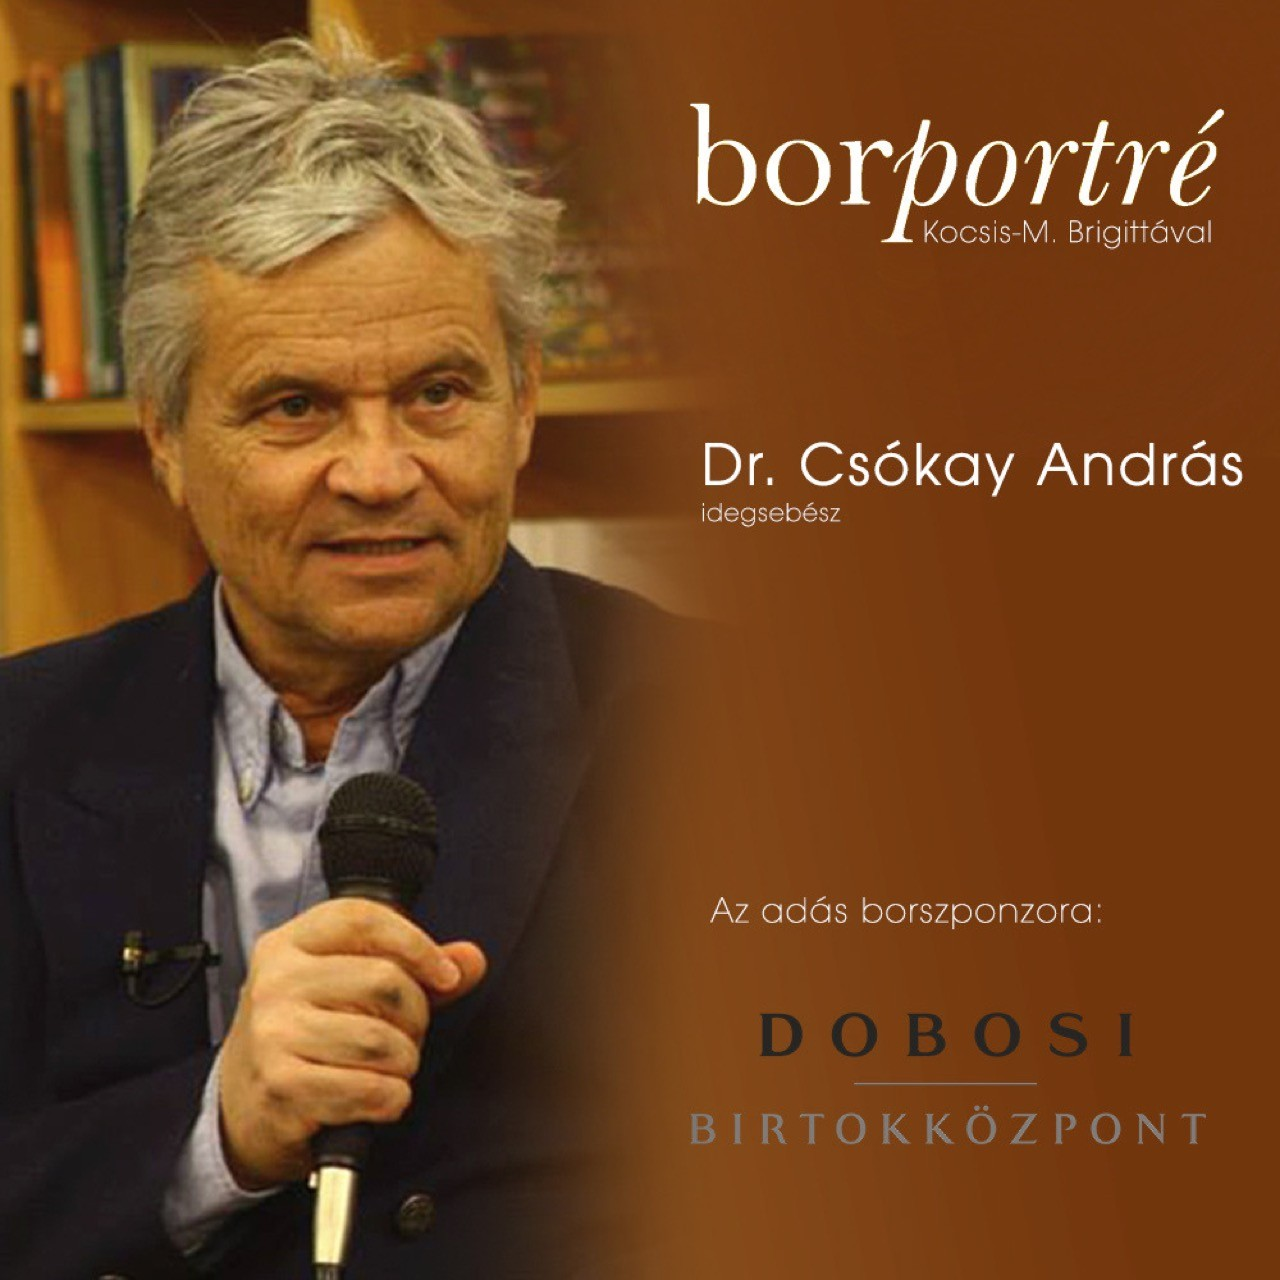 borportre_2020_12_16_Dr_Csokay_Andras_idegsebesz_Dobosi_kocka 2